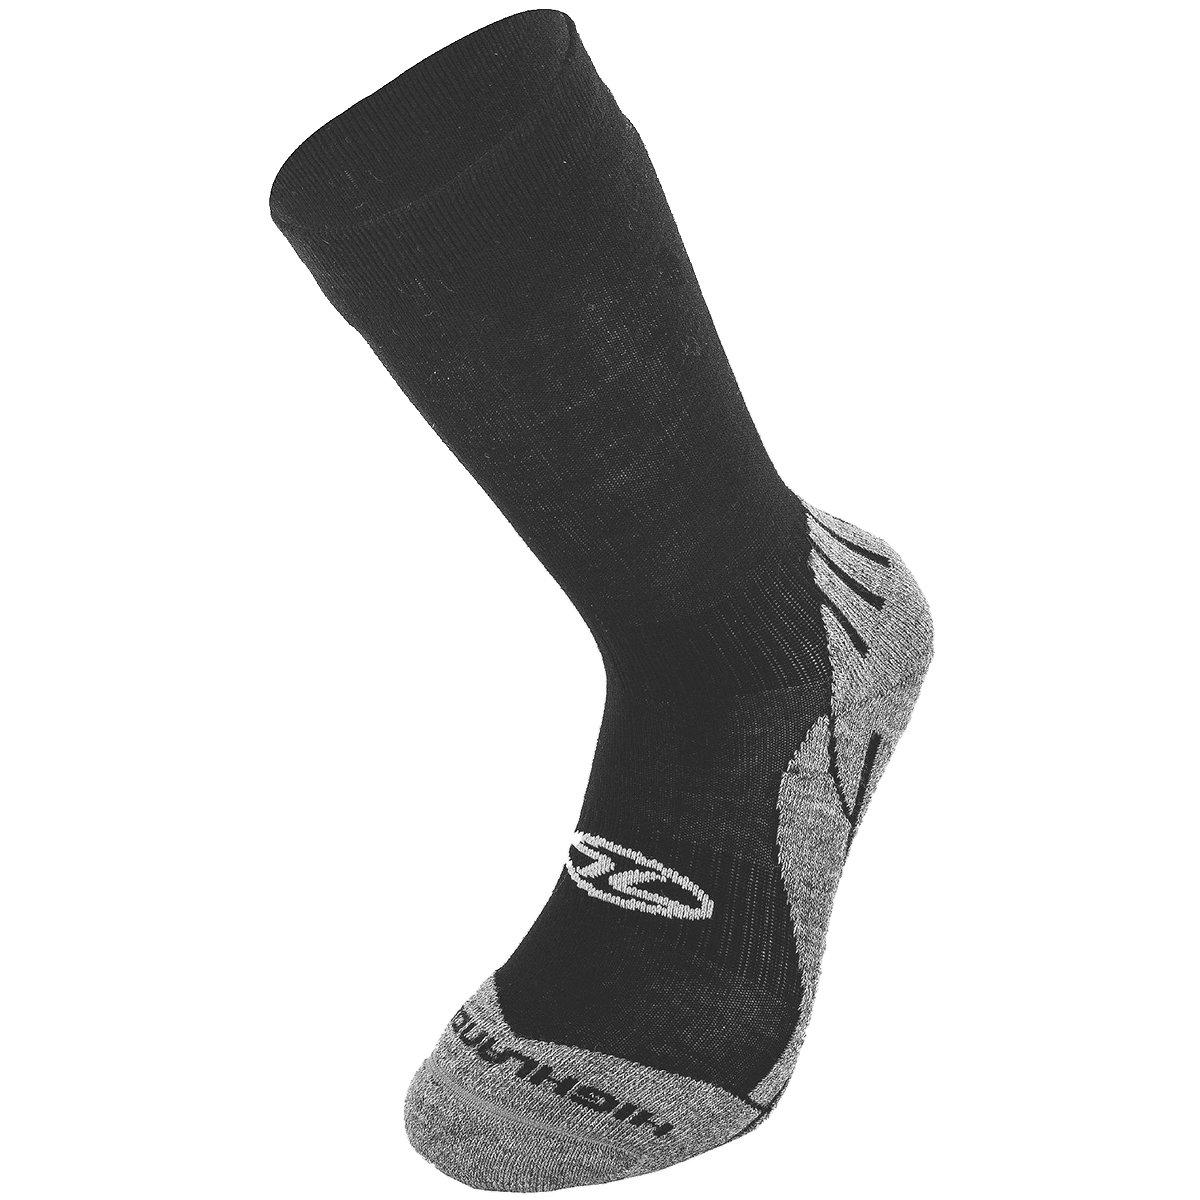 Highlander BAMBOO Trek Socks Mens Hiking Trekking Anti-bacterial Lightweight